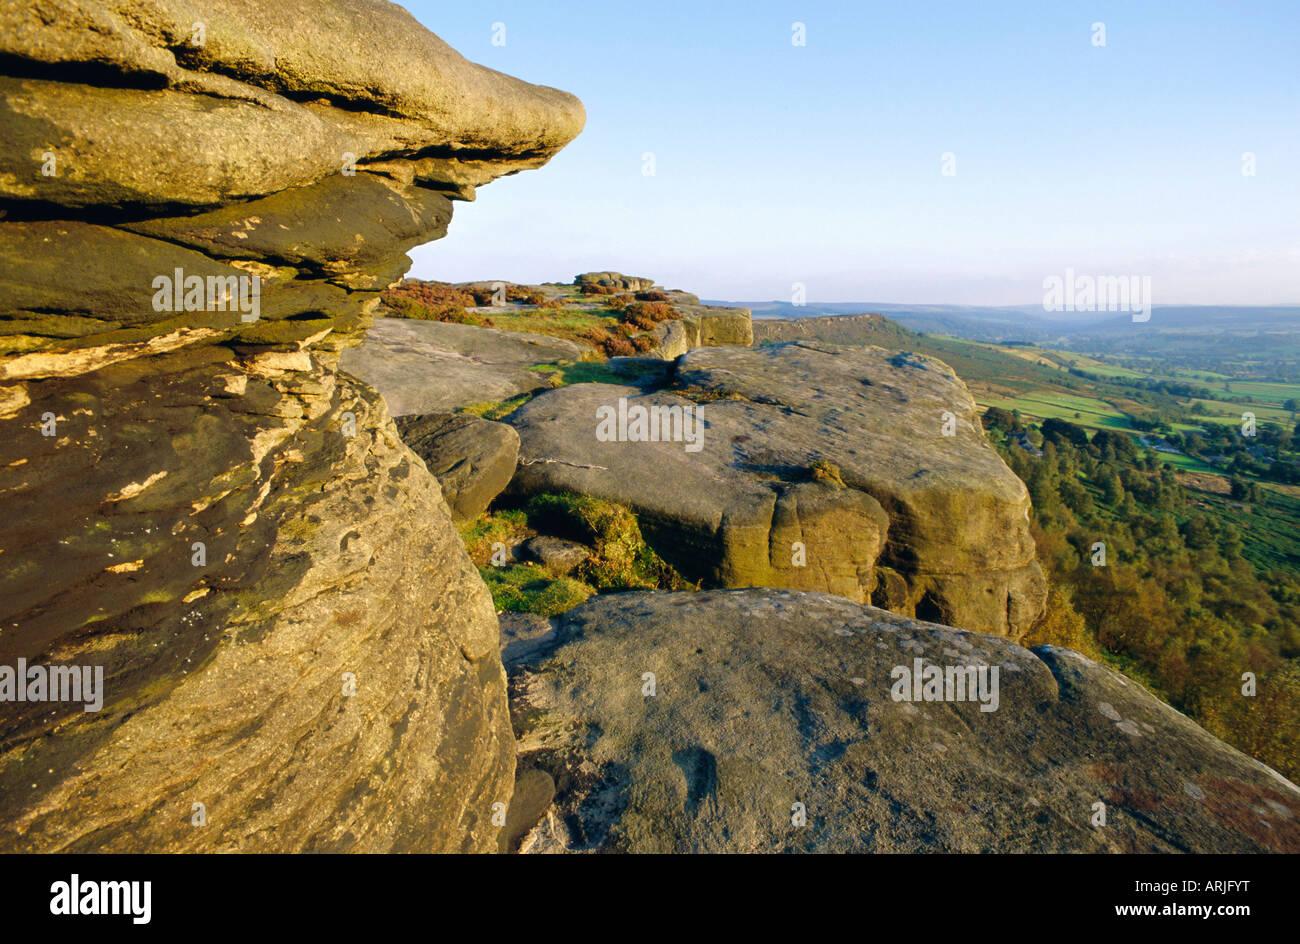 Gritstone rock formations, Froggatt Edge, Peak District National Park, Derbyshire, England - Stock Image